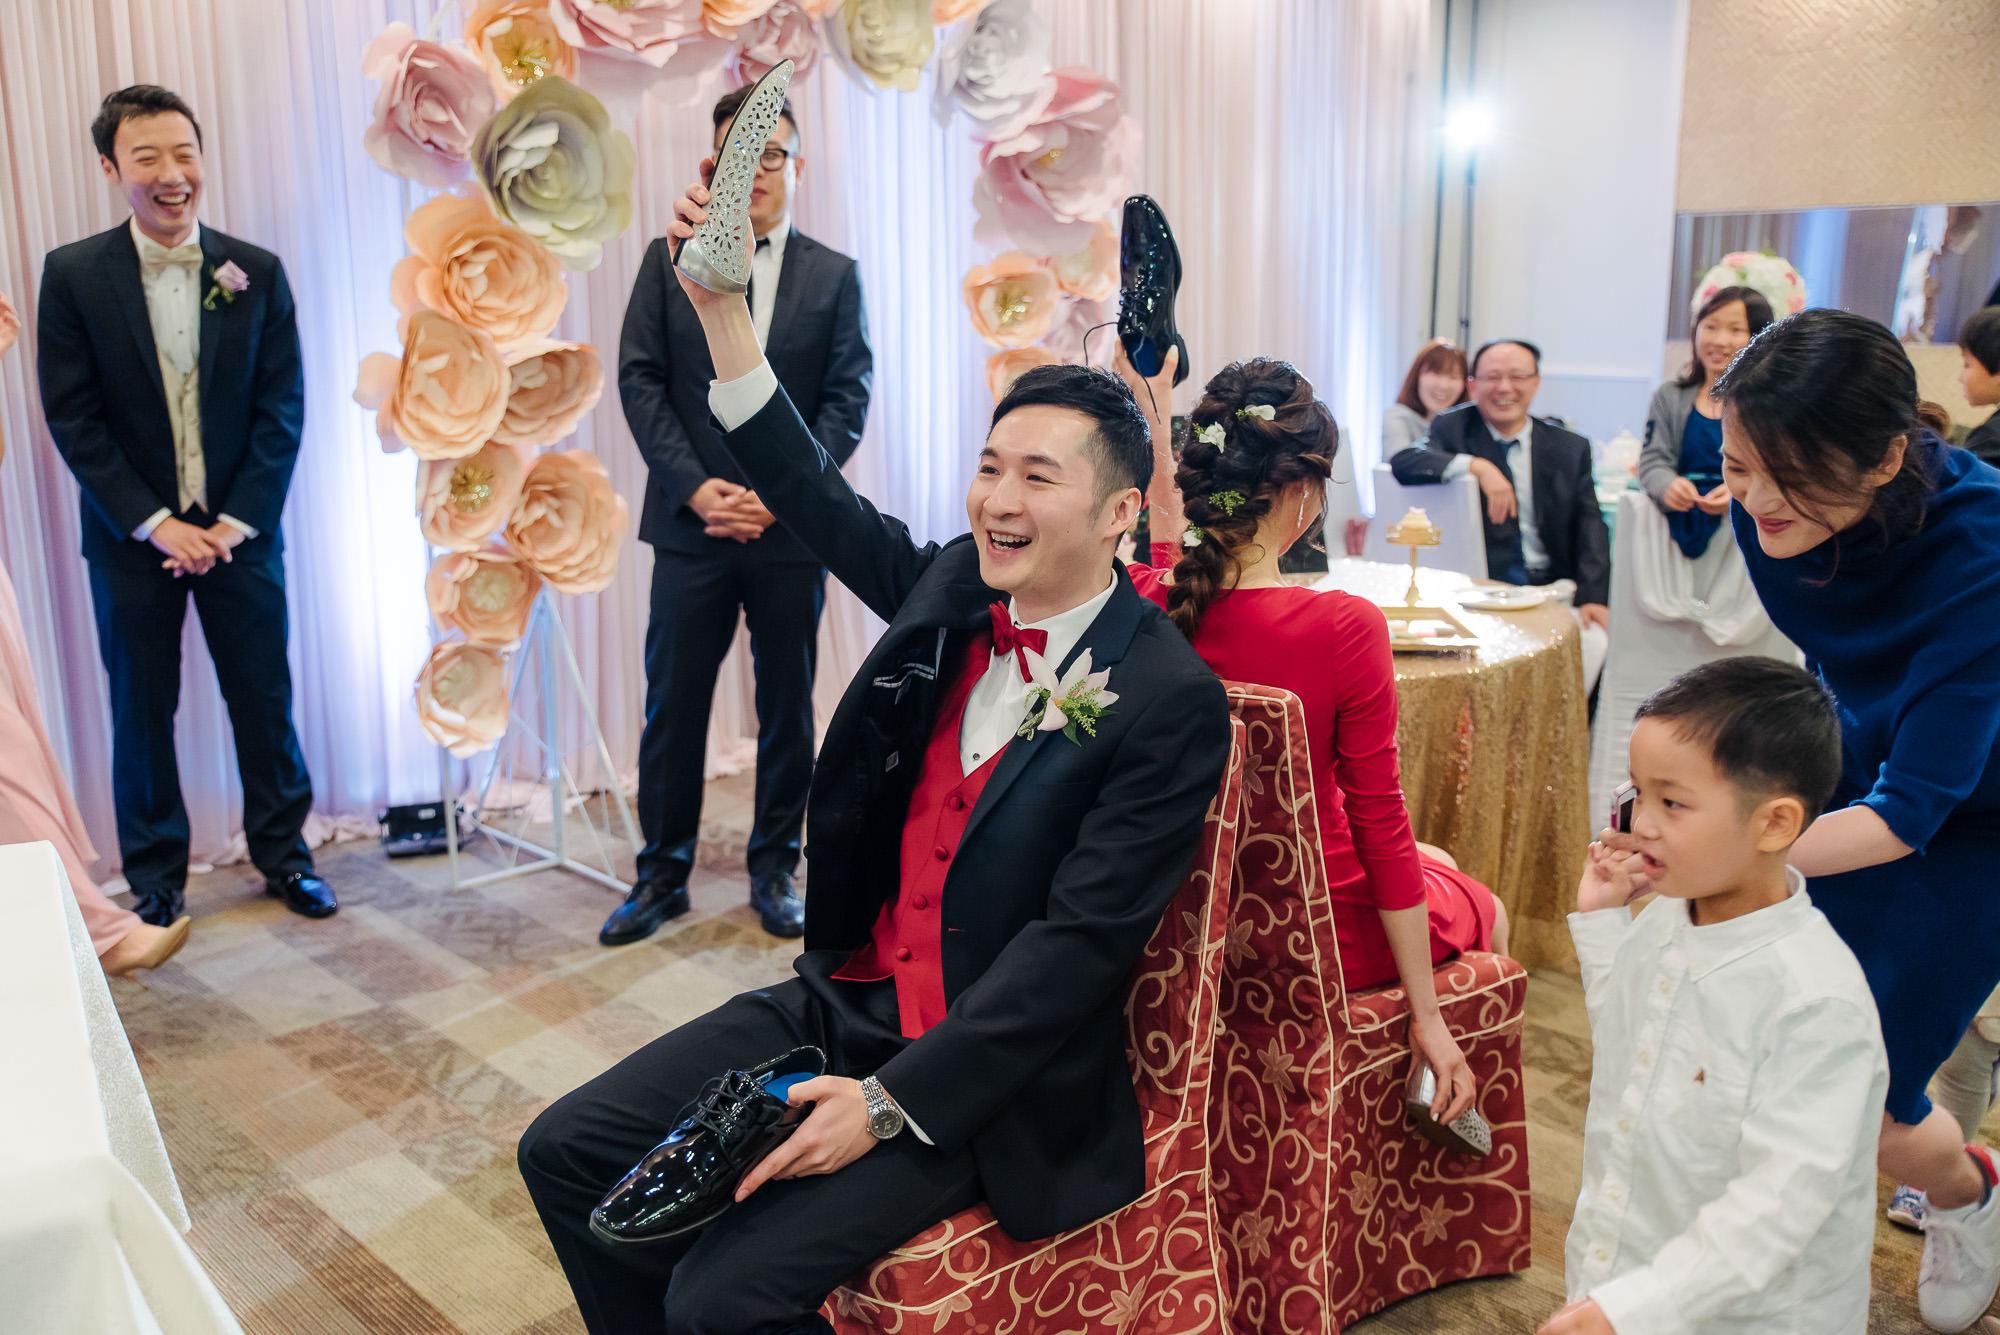 richmond_wedding_reception 21042811.jpg